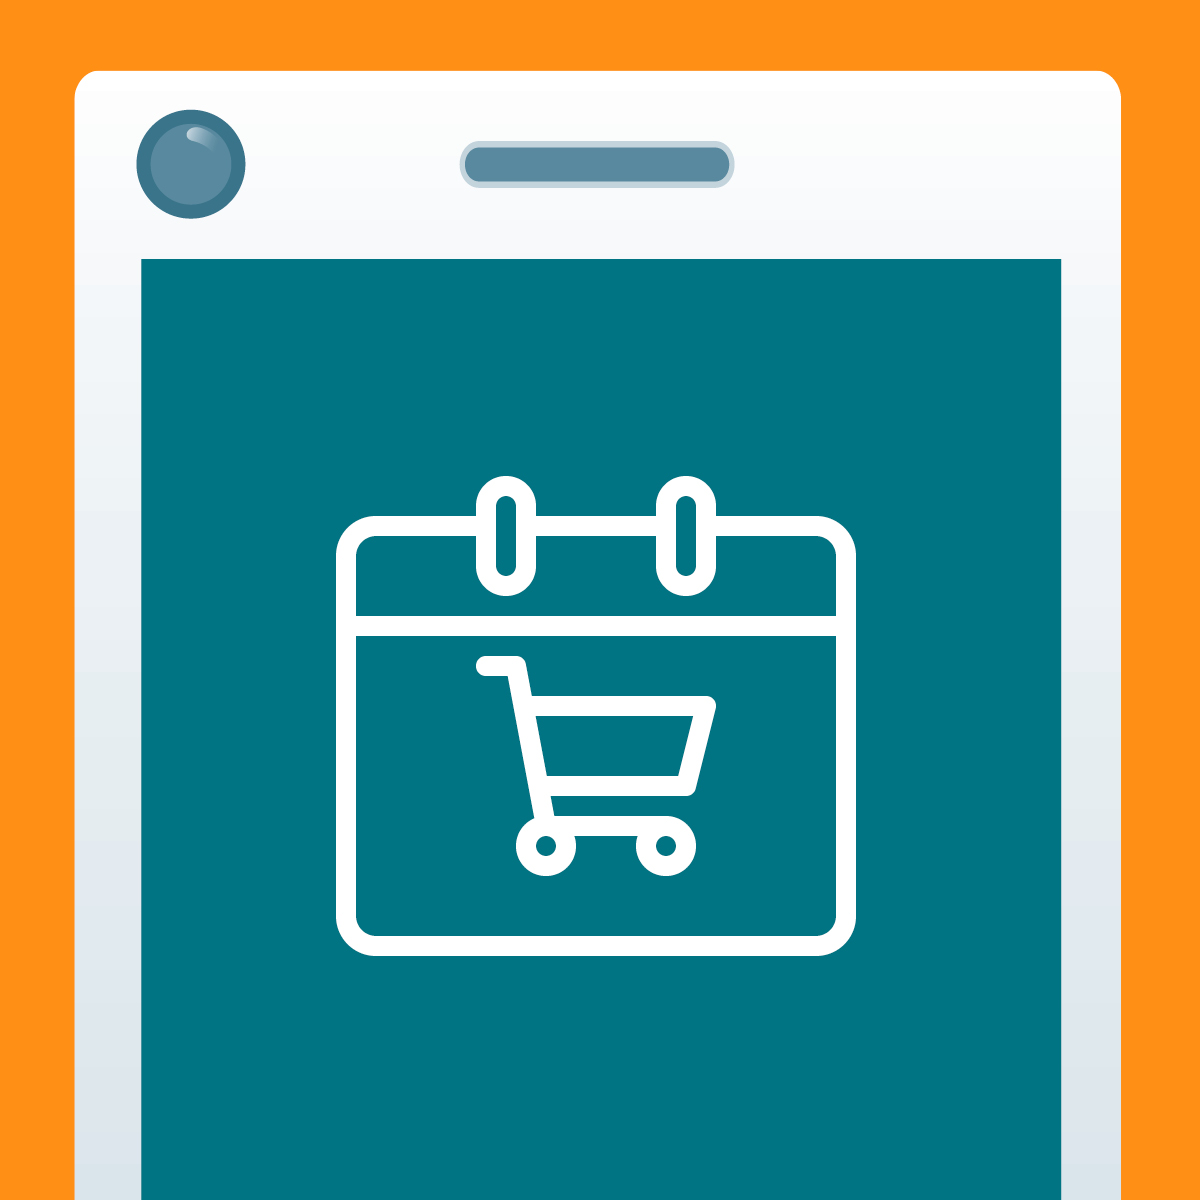 Online/Digital Marketing - Ecommerce + Website